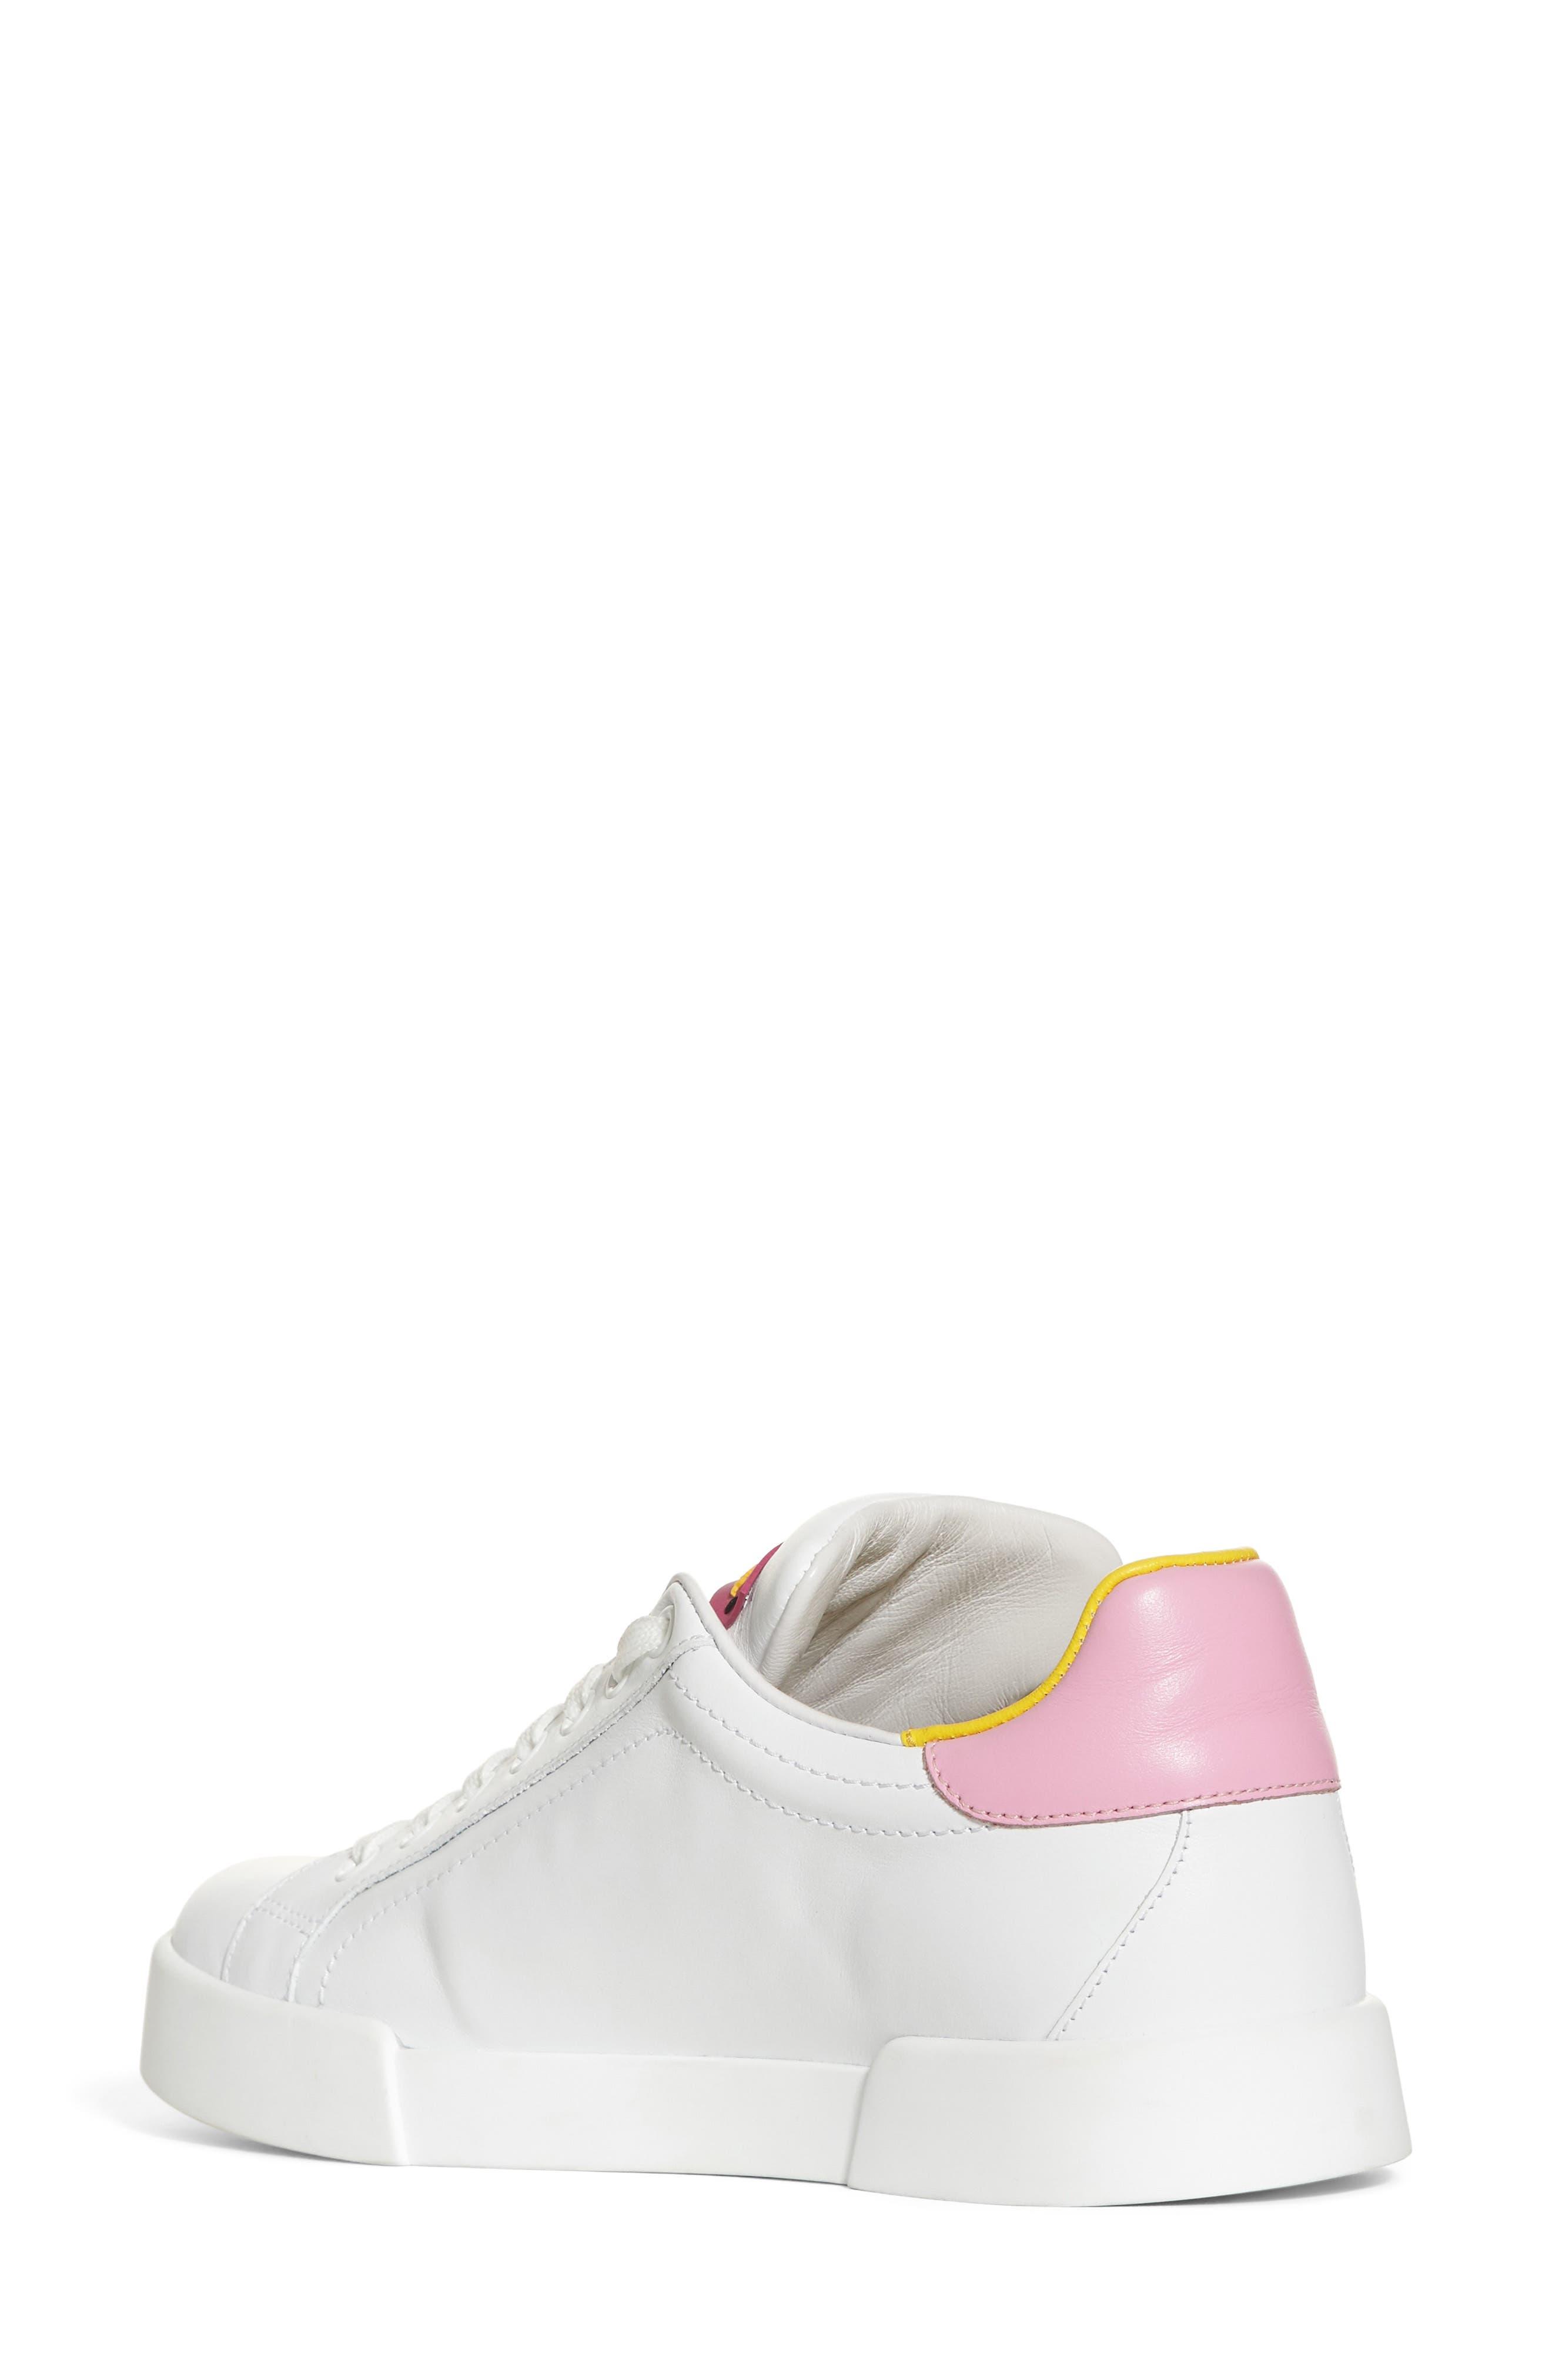 Lipstick Sneaker,                             Alternate thumbnail 2, color,                             White/ Pink